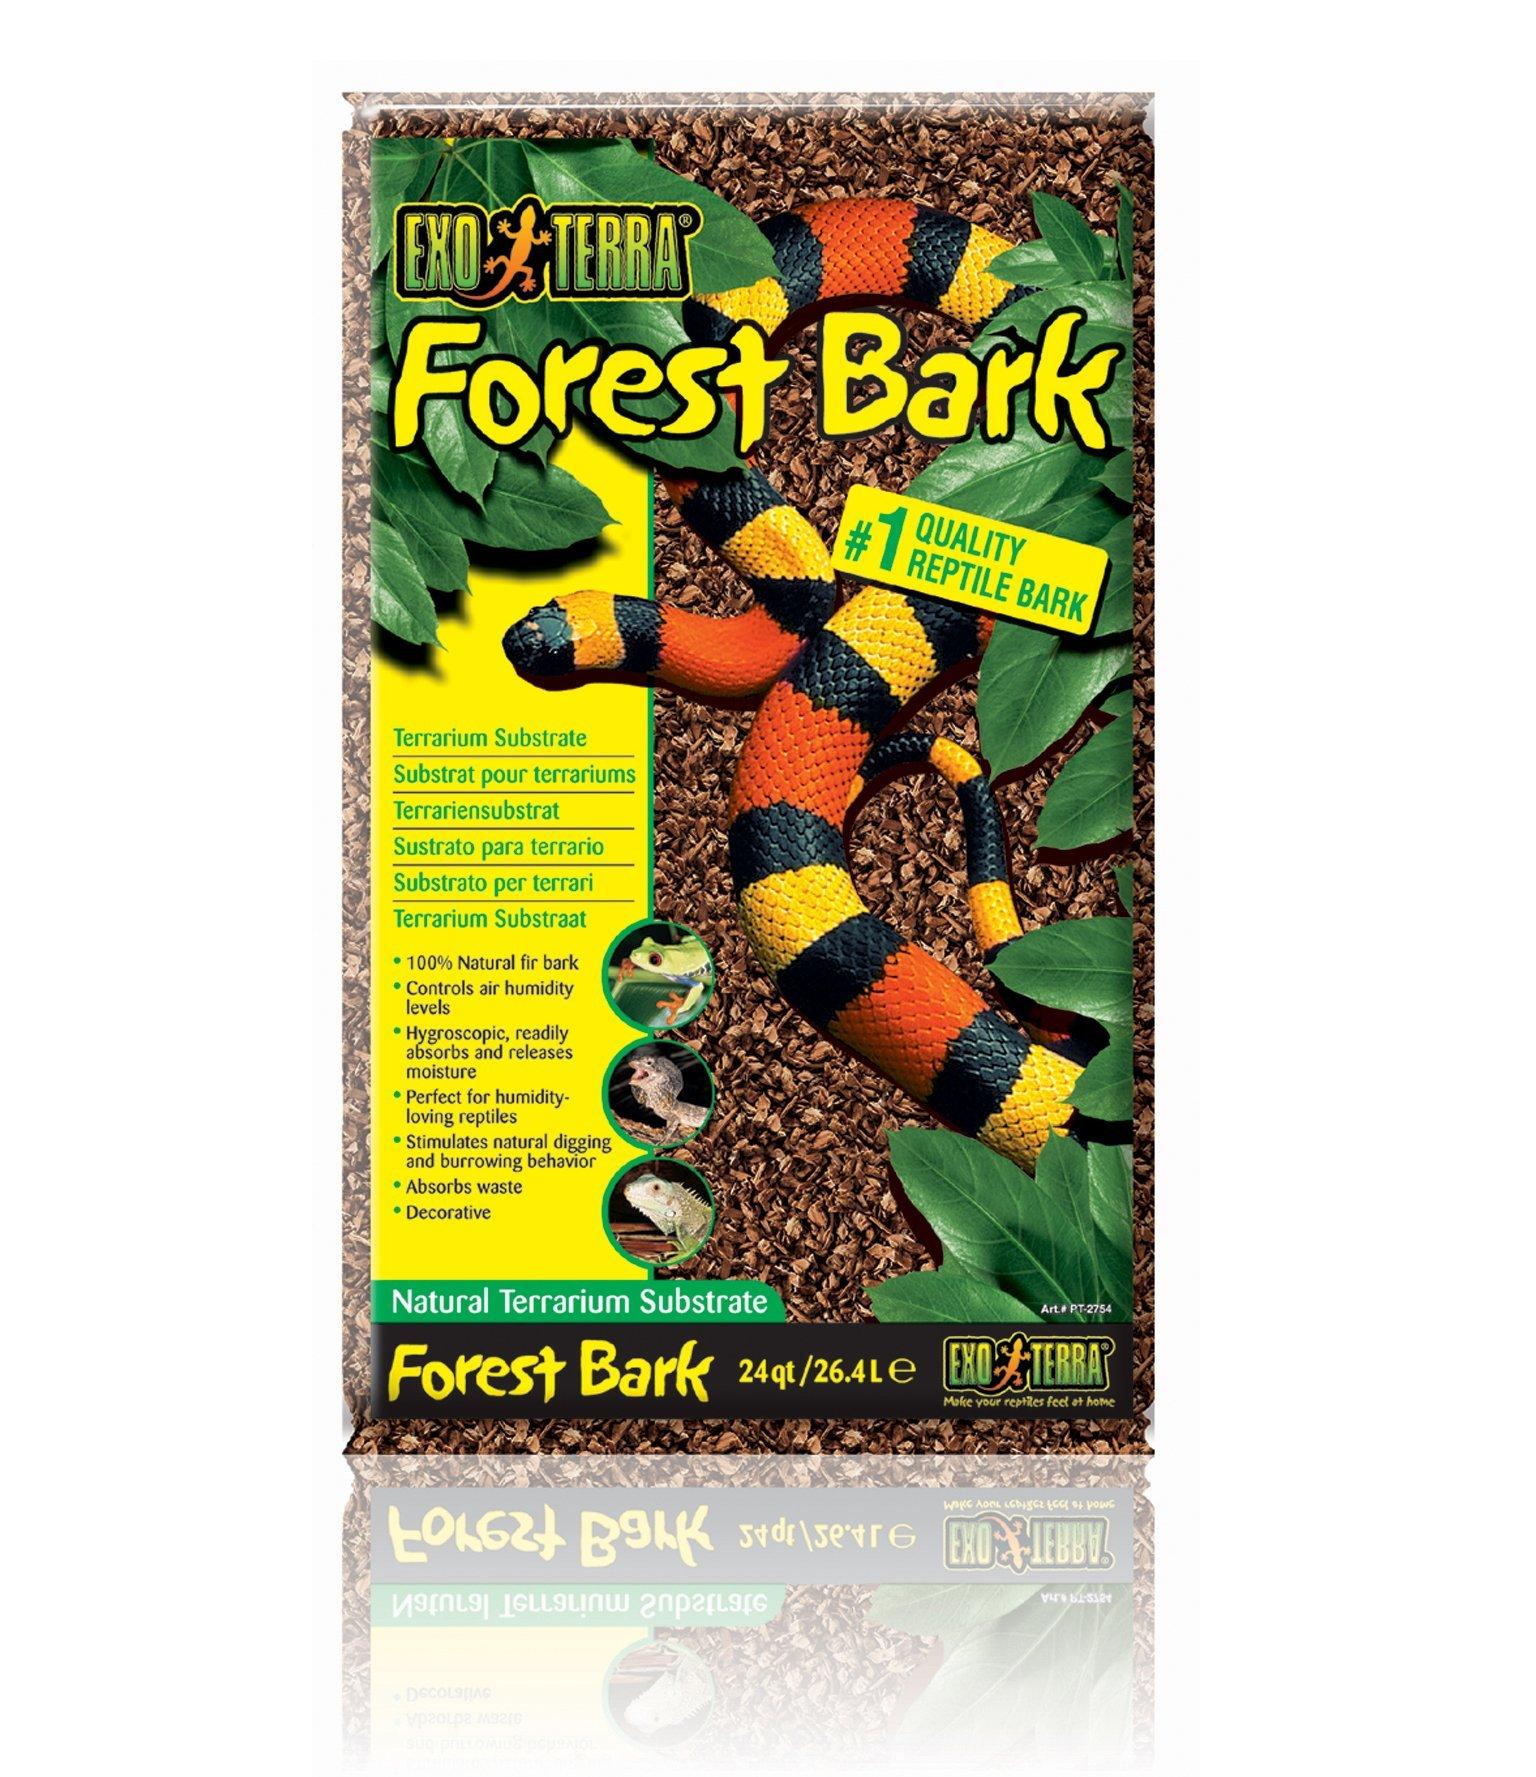 Exo Terra Exo Terra Forest Bark Terrarium Substrate, 26.4 L (24 Qt) by Exo Terra